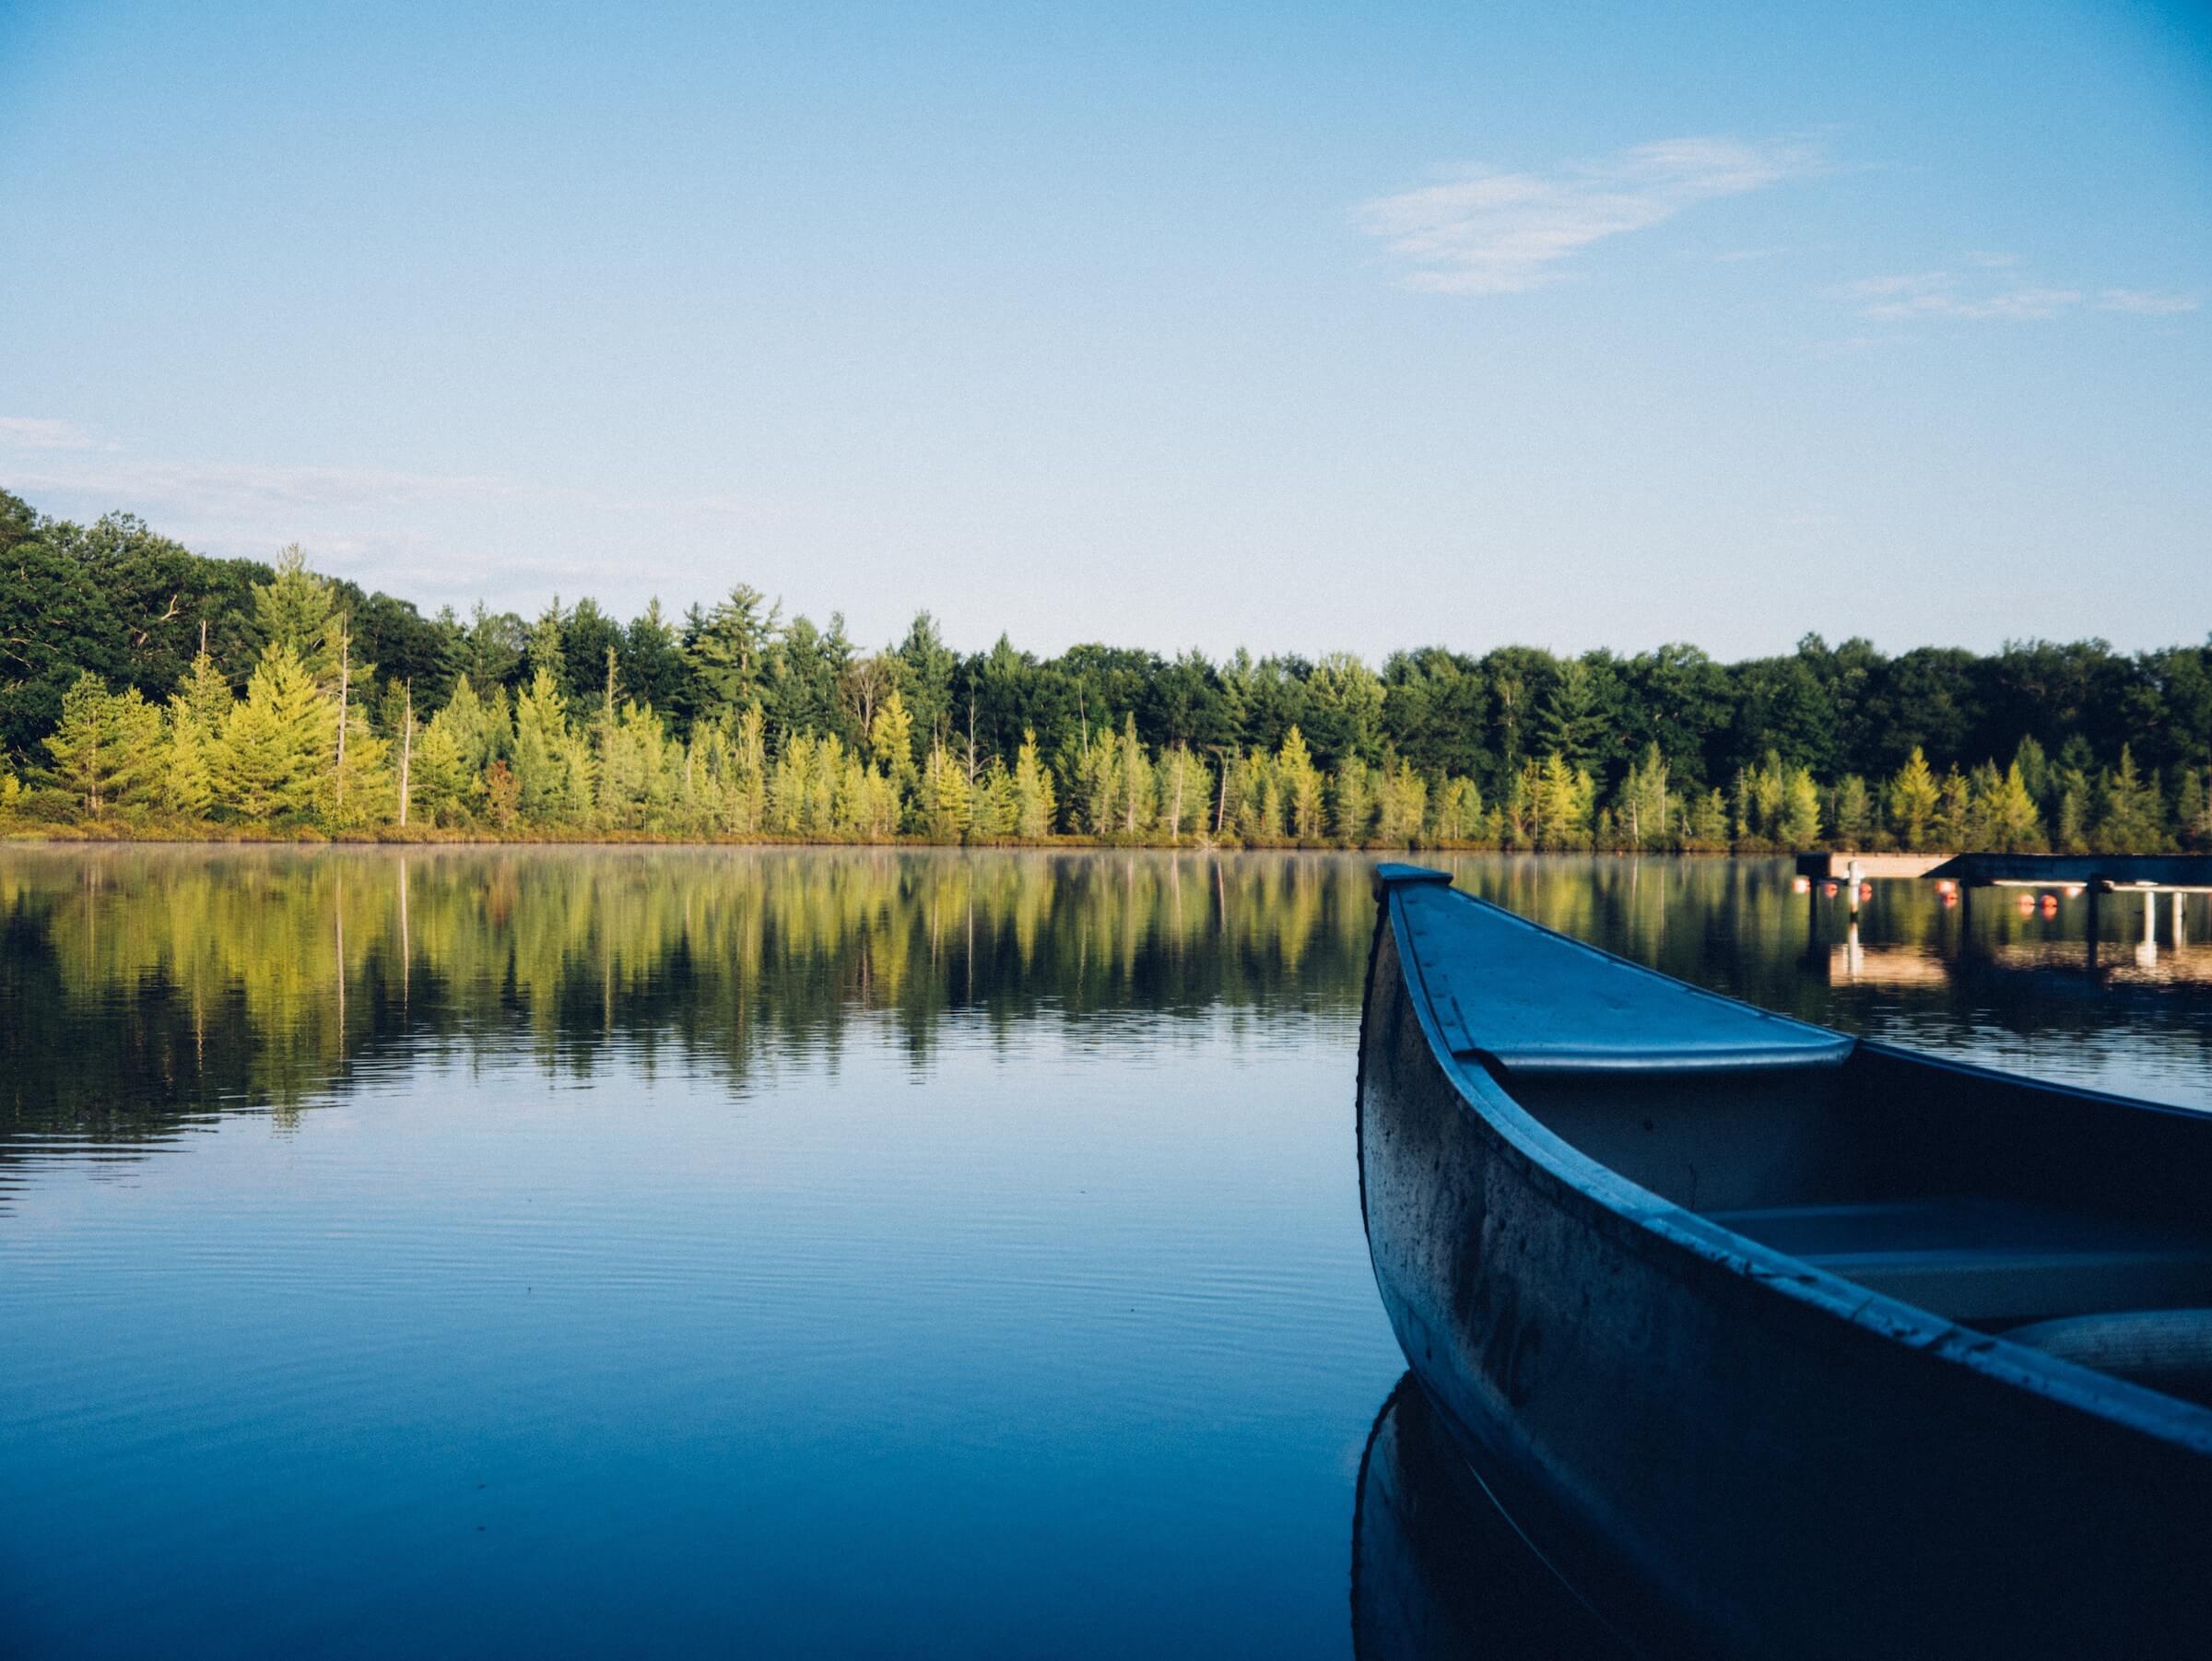 The lake photo